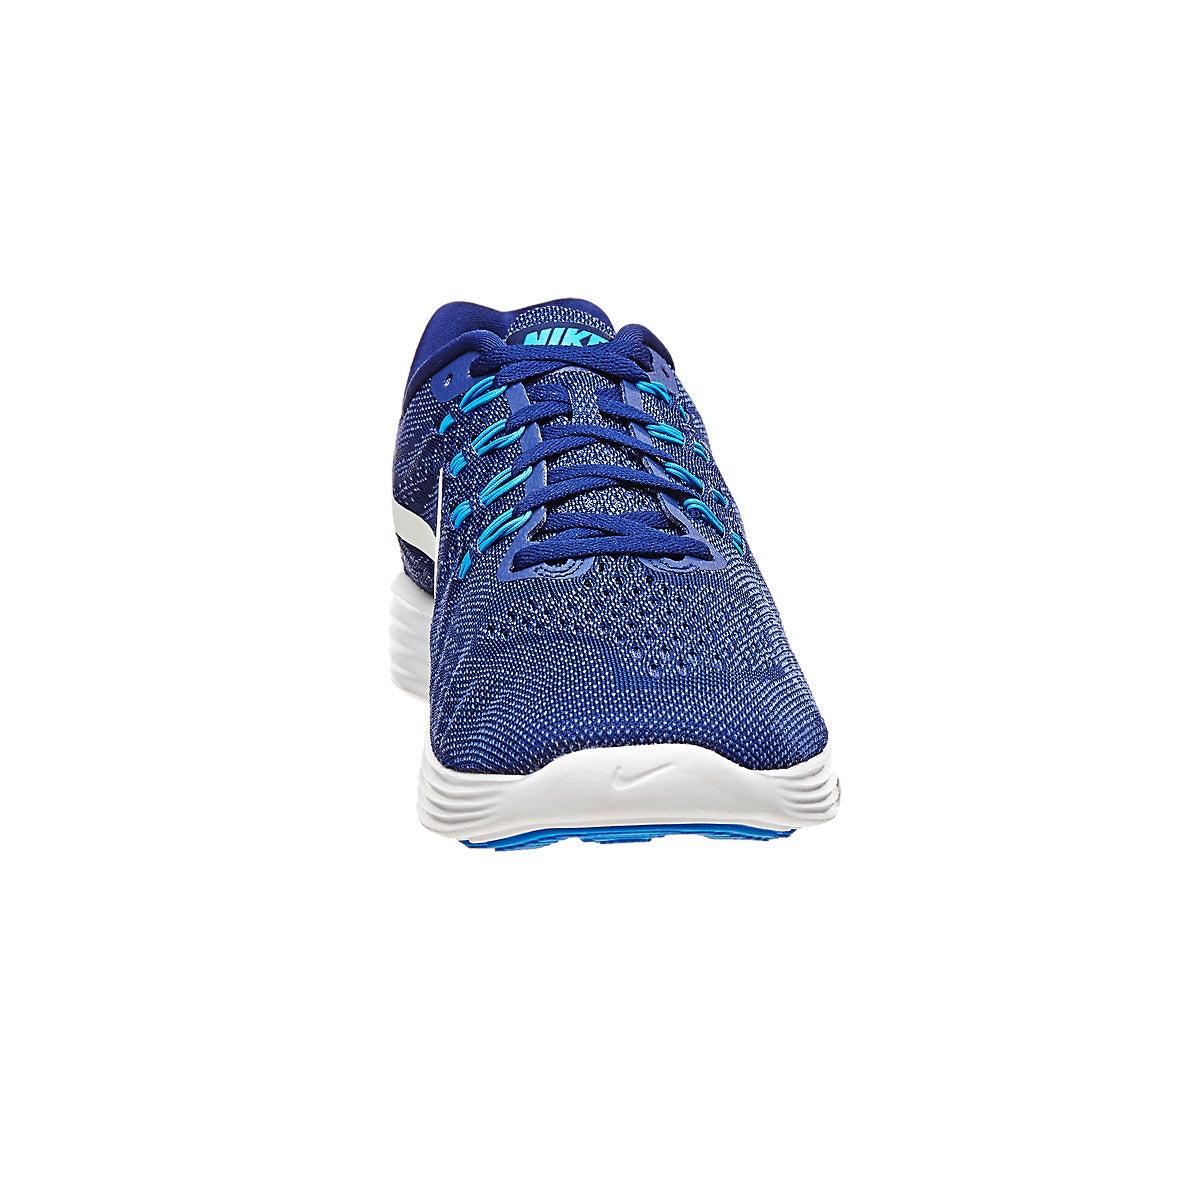 buy online e771b 1af4b ... netherlands nike lunartempo 2 mens shoes loyal blue white 360 view running  warehouse . b1d91 5fd74